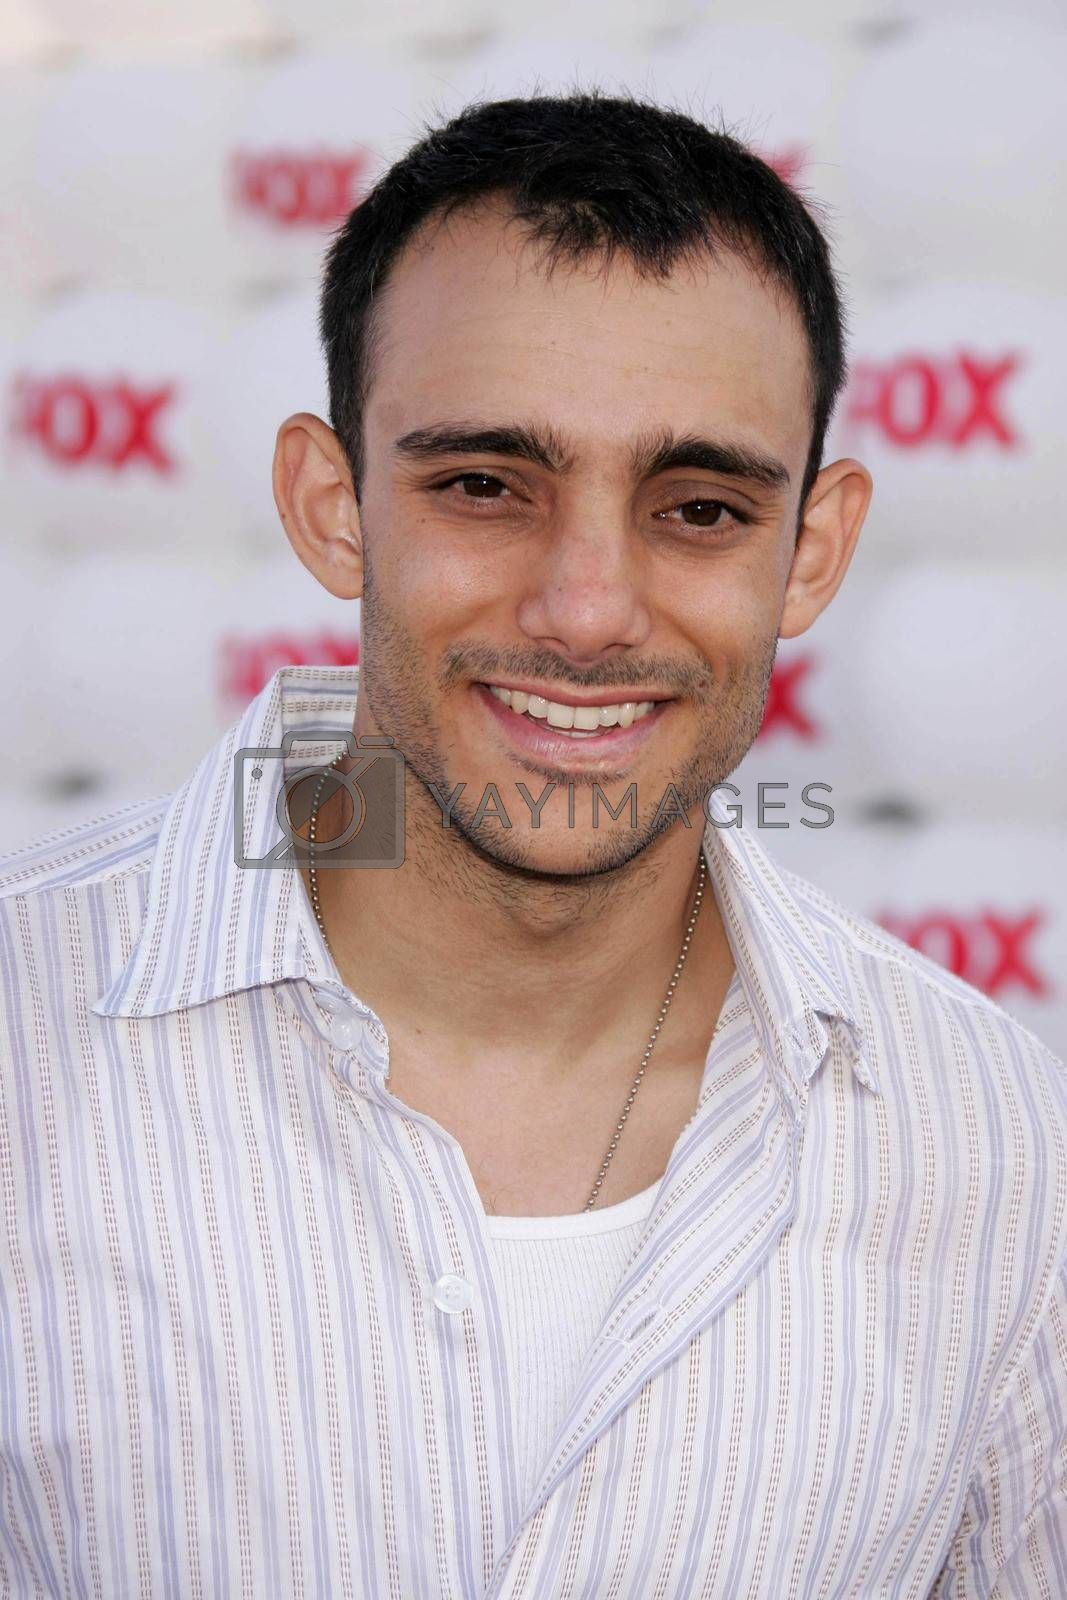 Omid Abtahi At the FOX Summer 2005 TCA Party, Santa Monica Pier, Santa Monica, CA 07-29-05